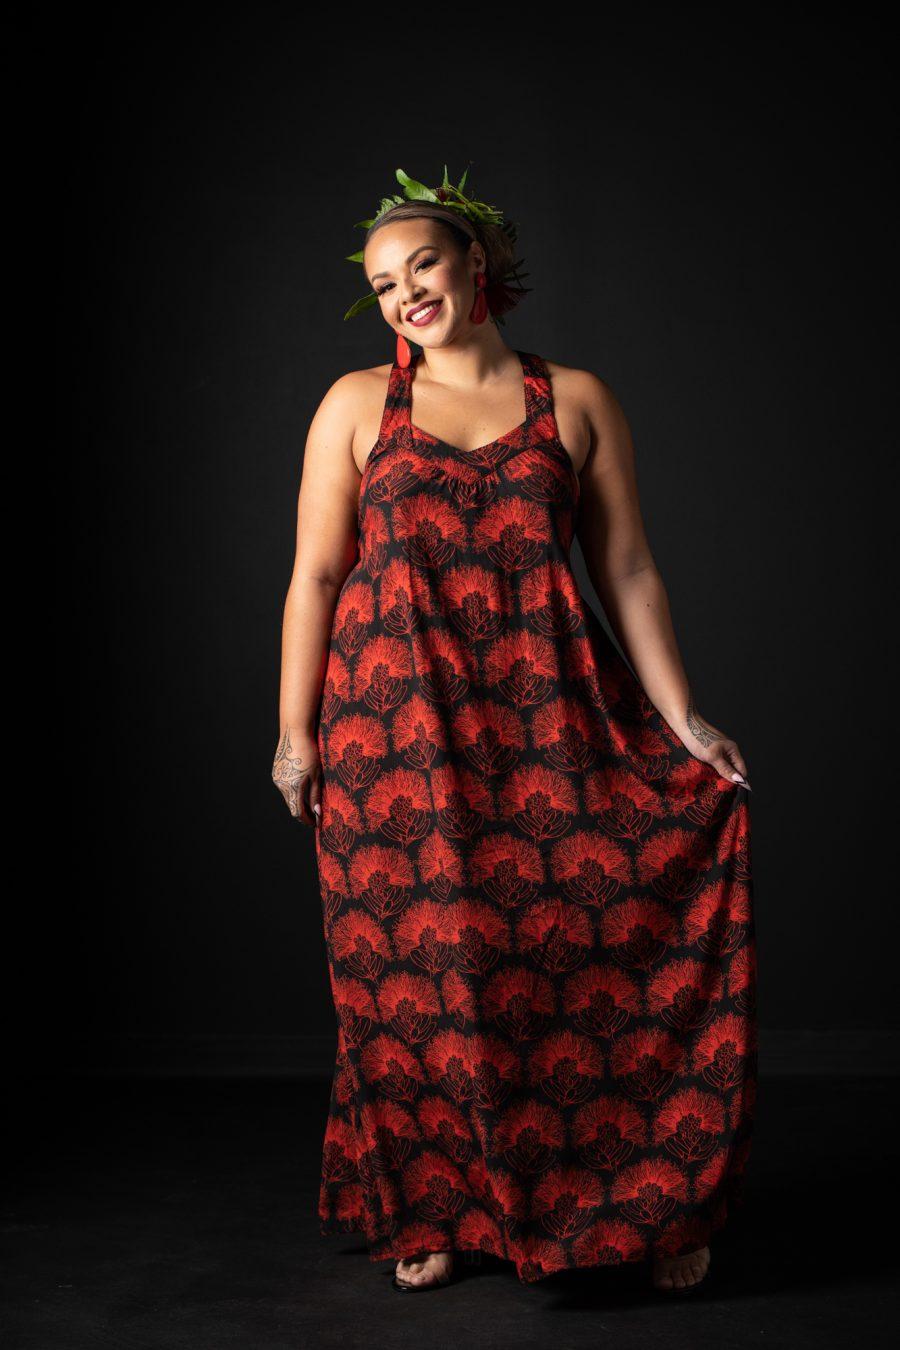 Model wearing Ihilani Dress in Black Firey Red Kalihilehua Pattern - Front View